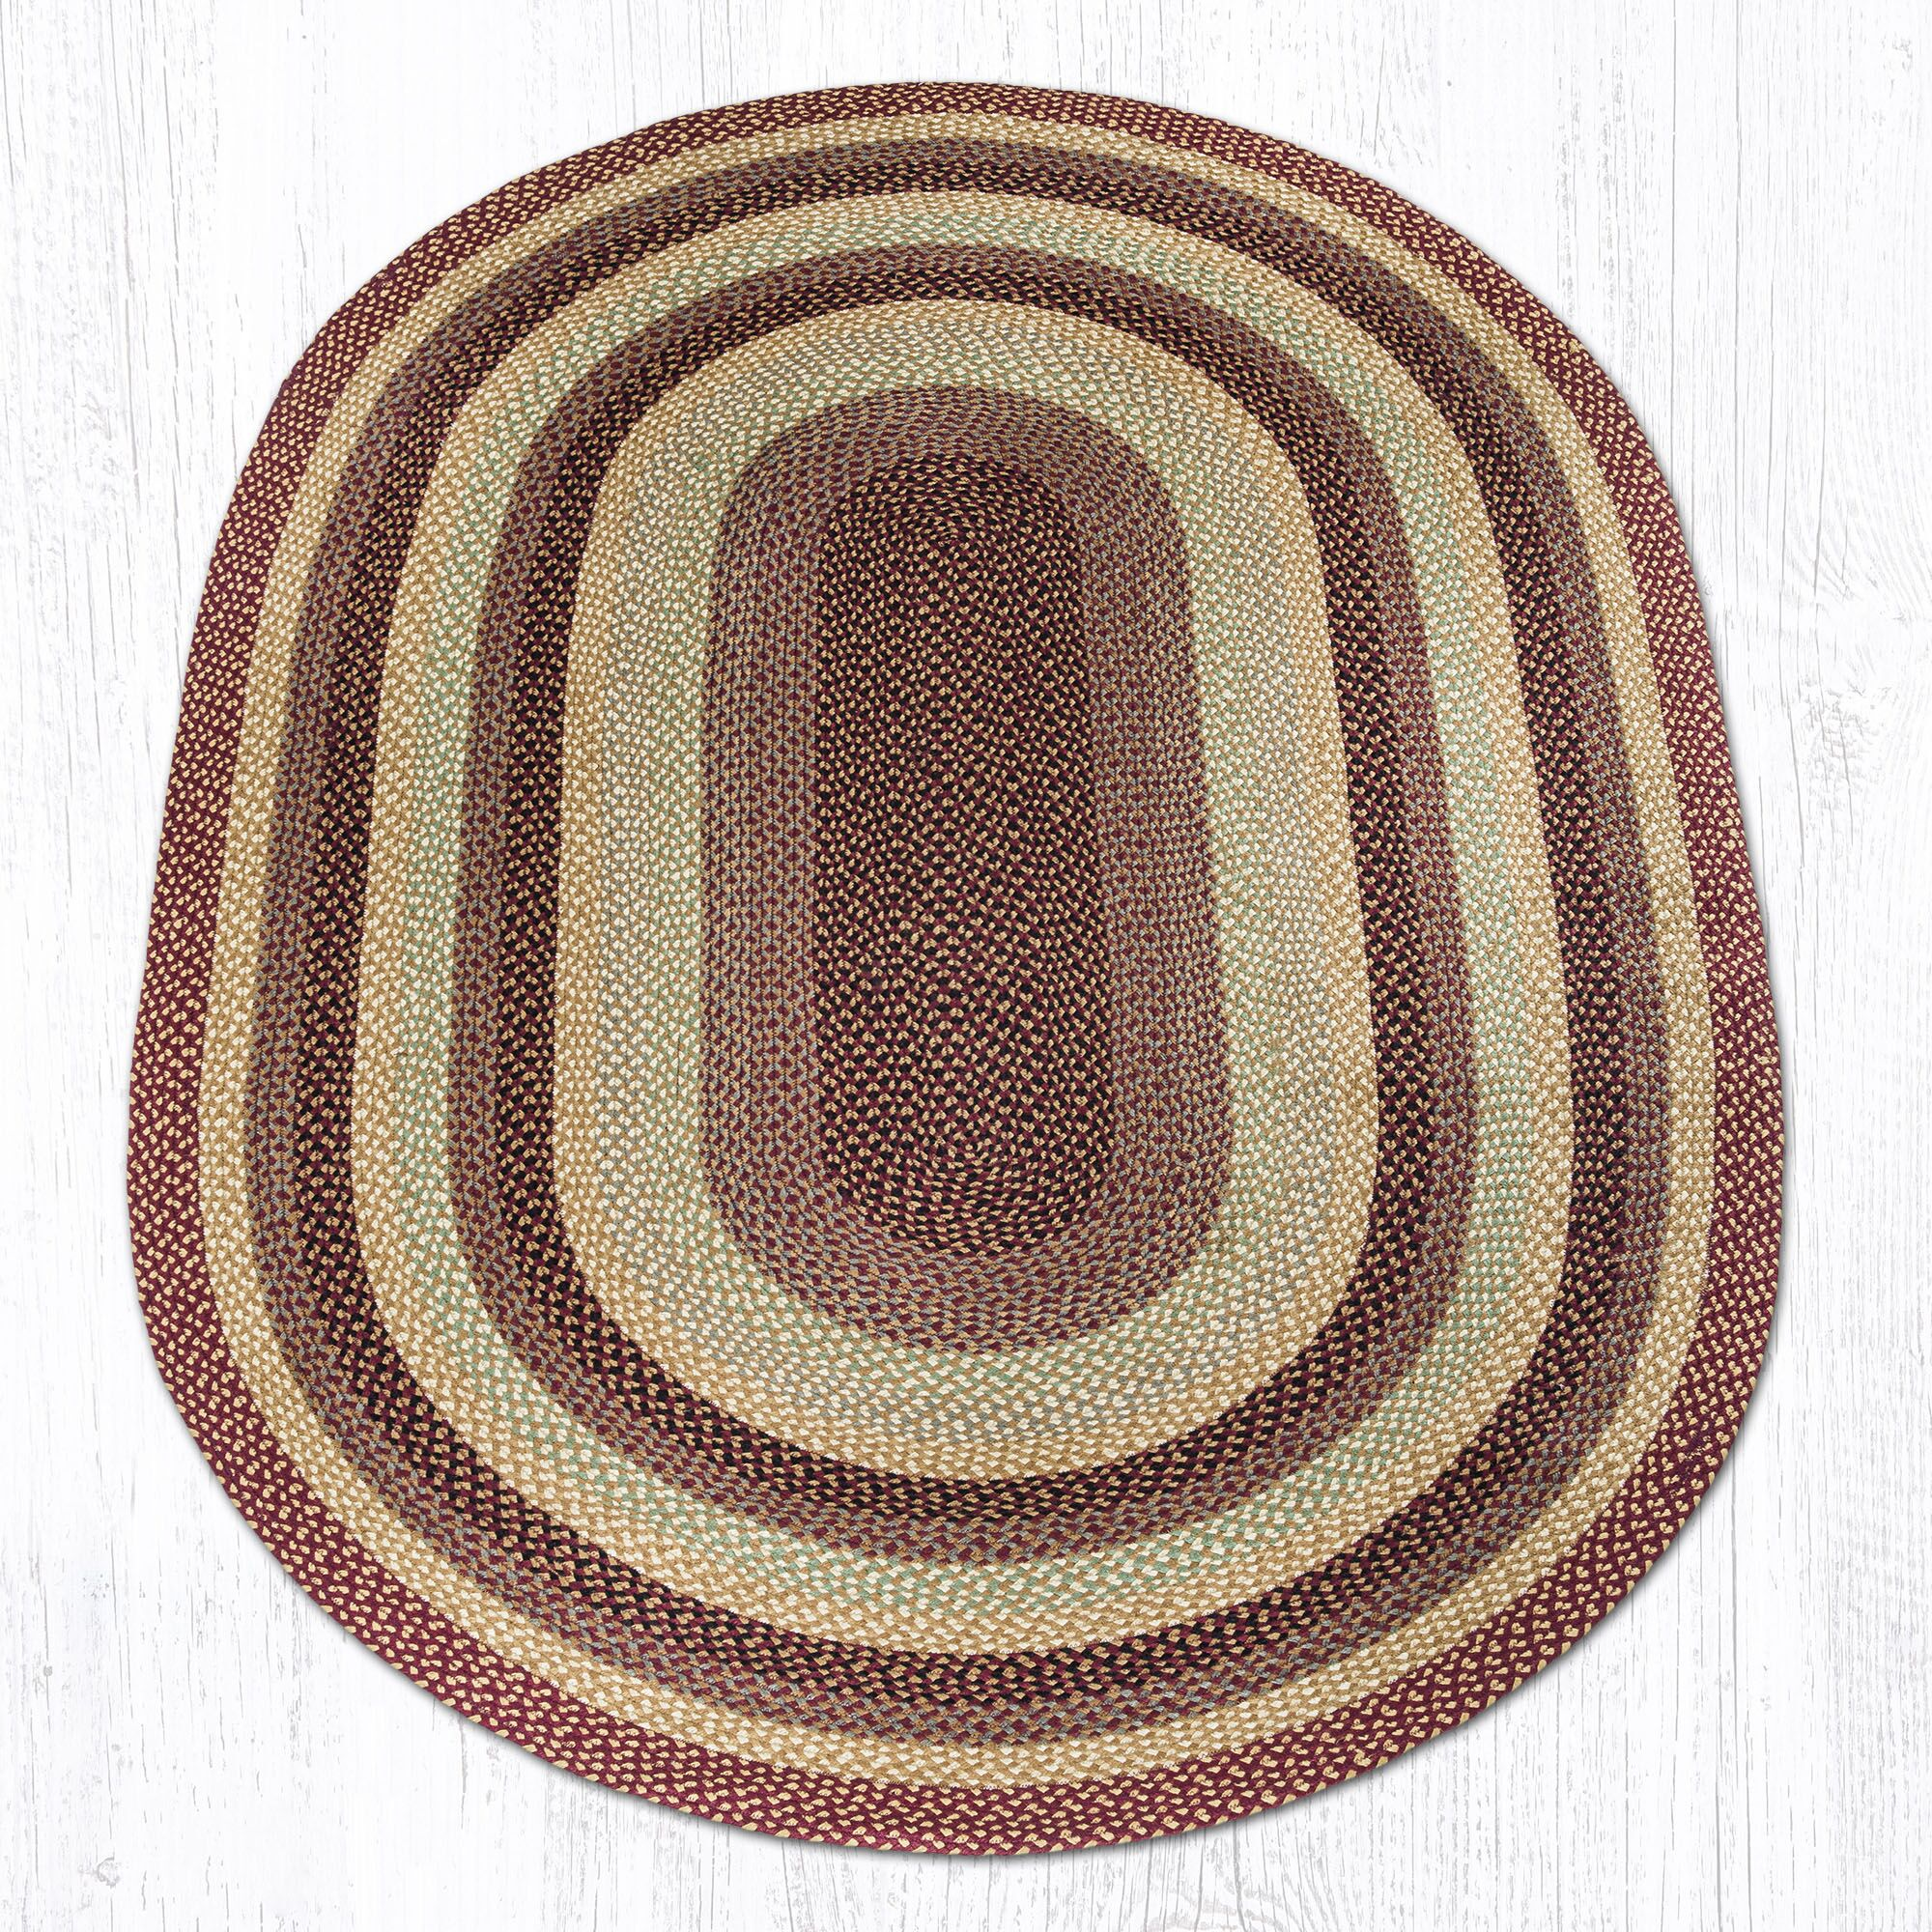 Burgundy/Gray/Crème Braided Area Rug Rug Size: Oval 6' x 9'